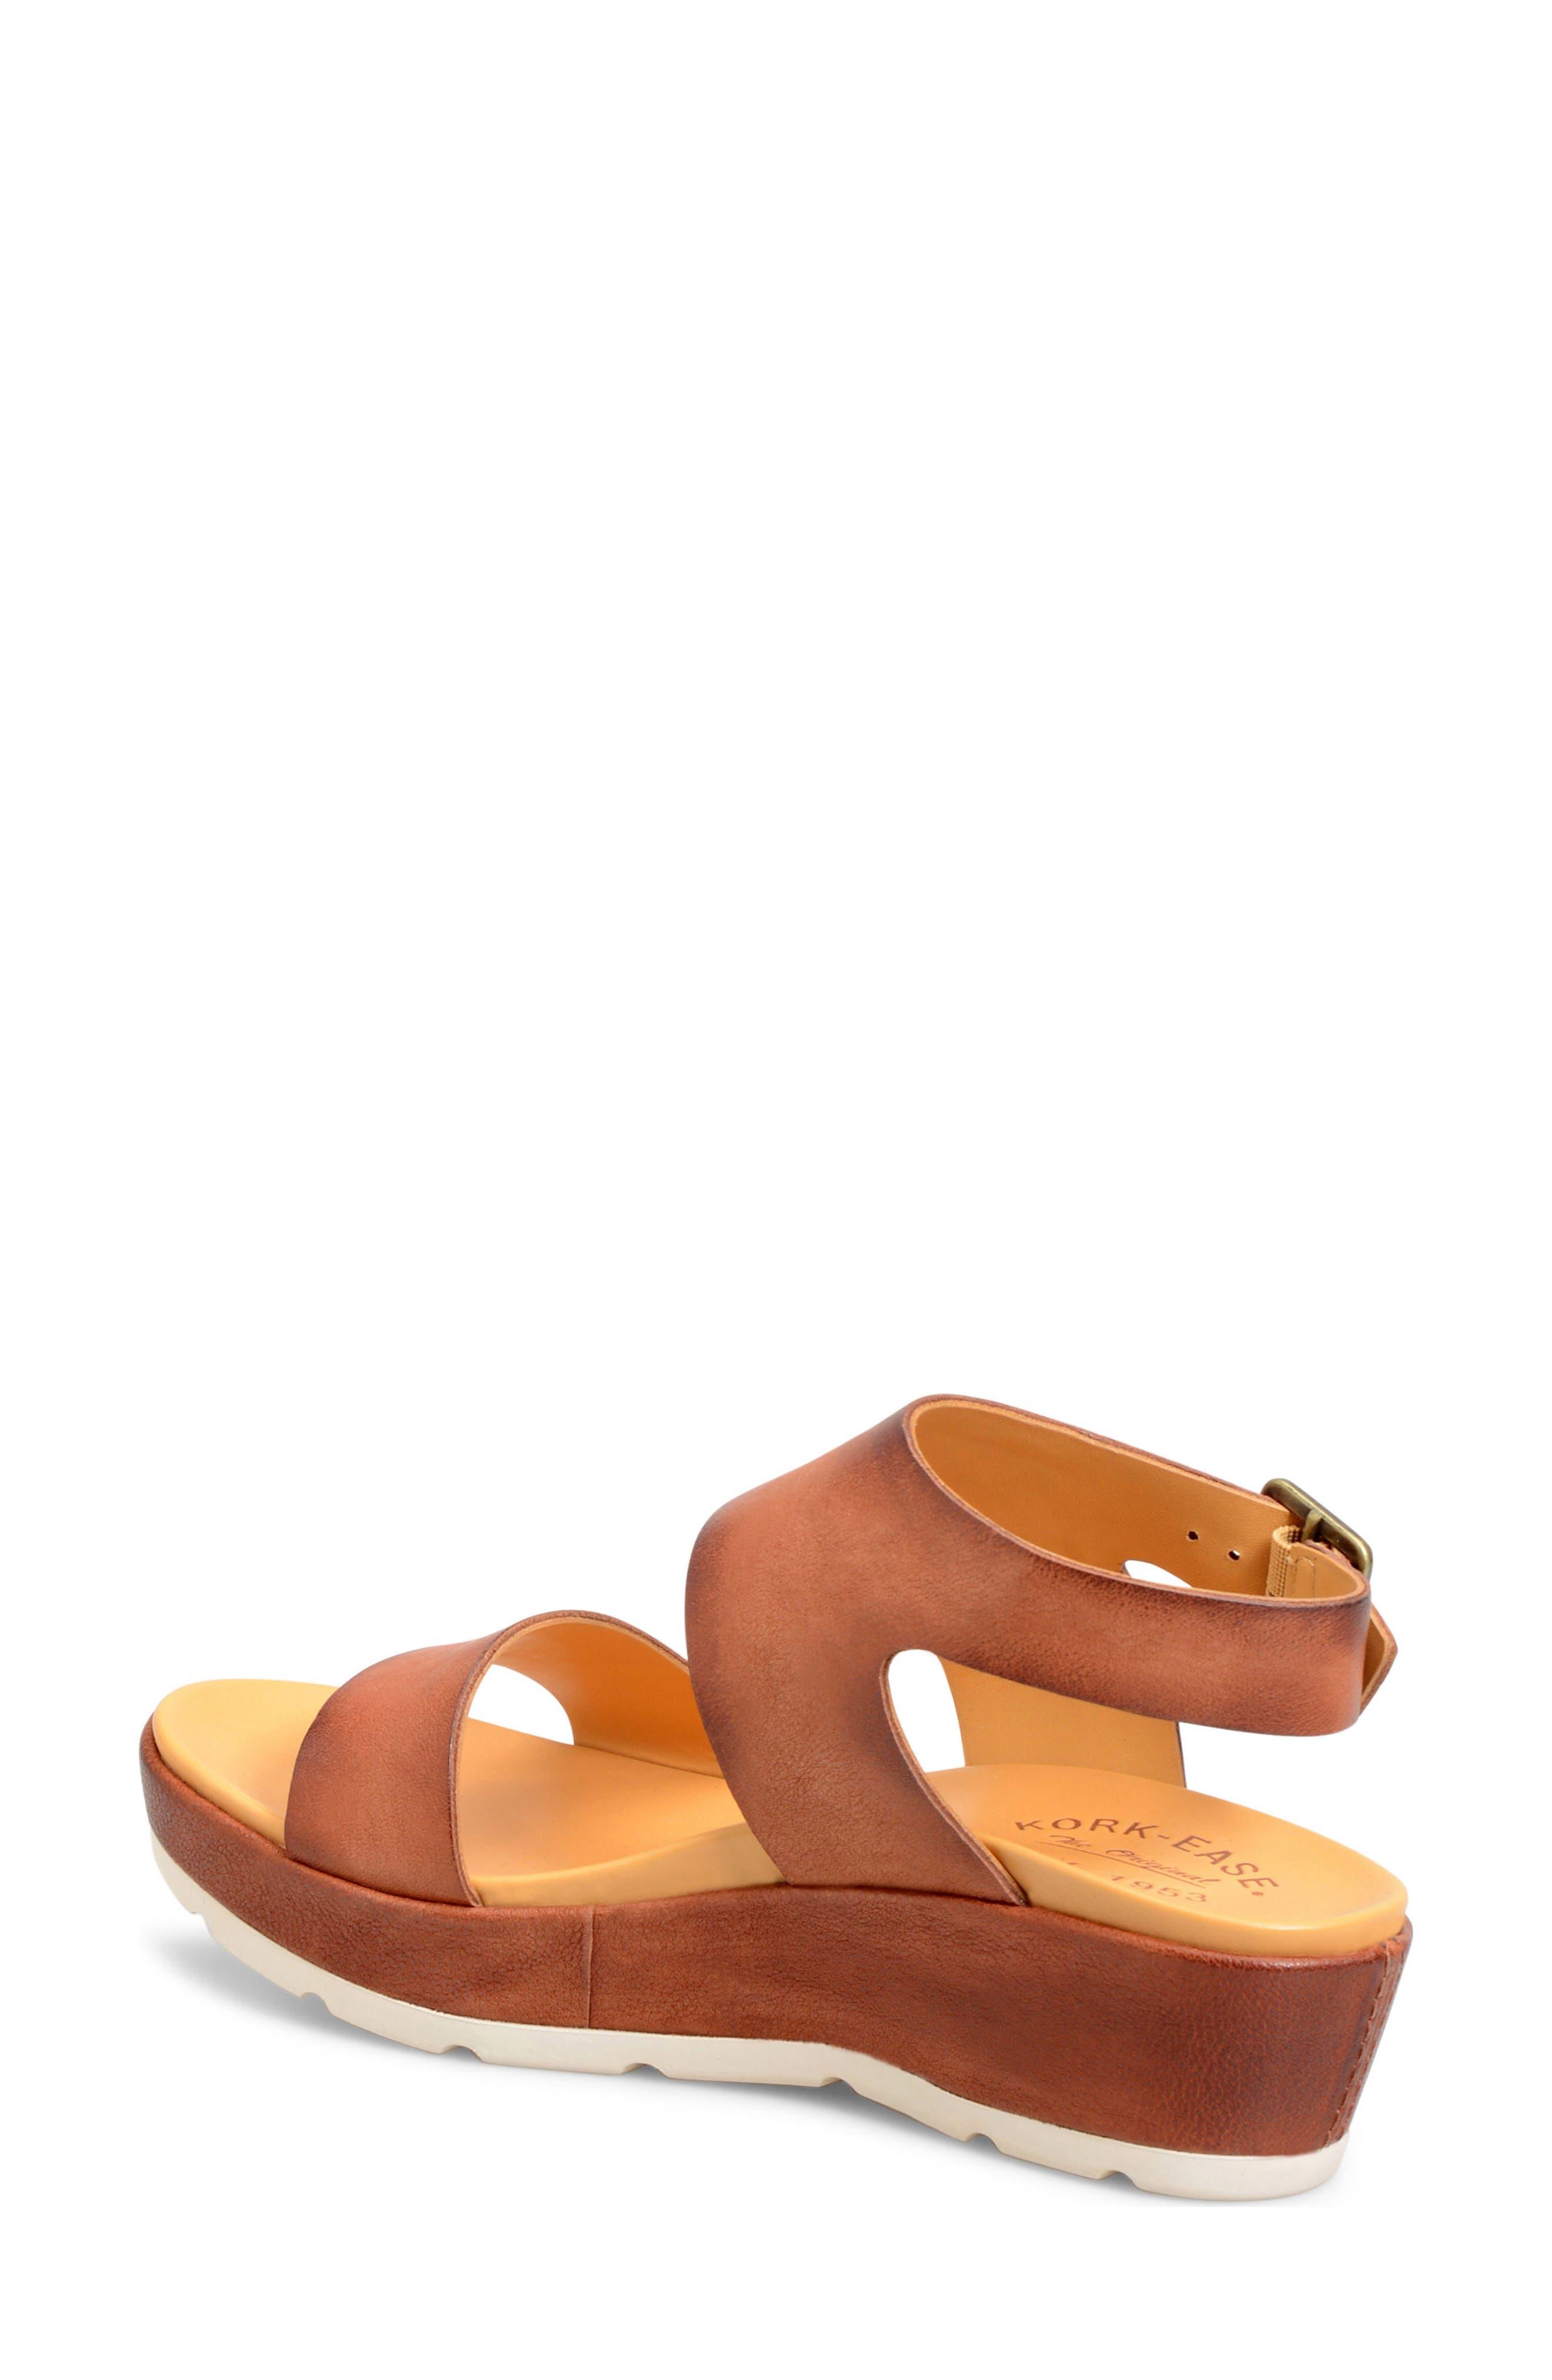 'Khloe' Platform Wedge Sandal,                             Alternate thumbnail 8, color,